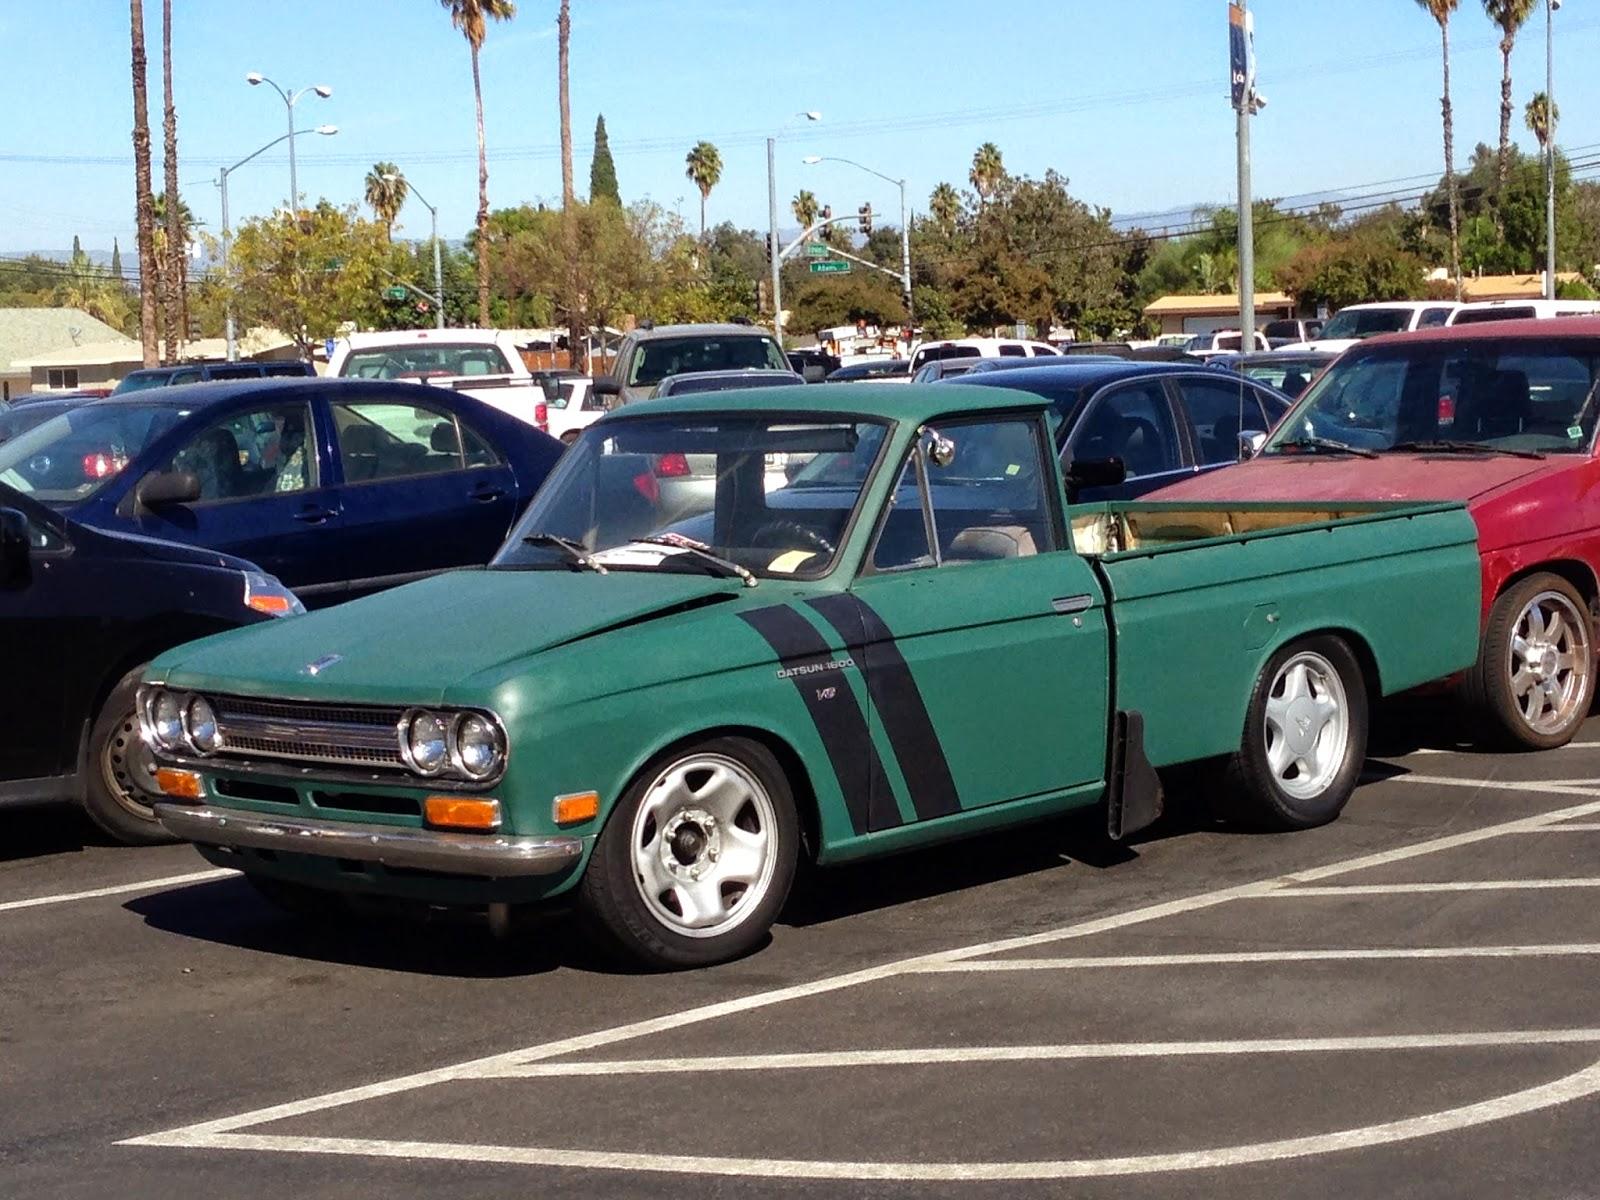 1970 Datsun Truck Wiring Harness Simple Diagram Classic Car Daily Turismo 10k Ratsun Datstang 521 Pickup V8 Swap 510